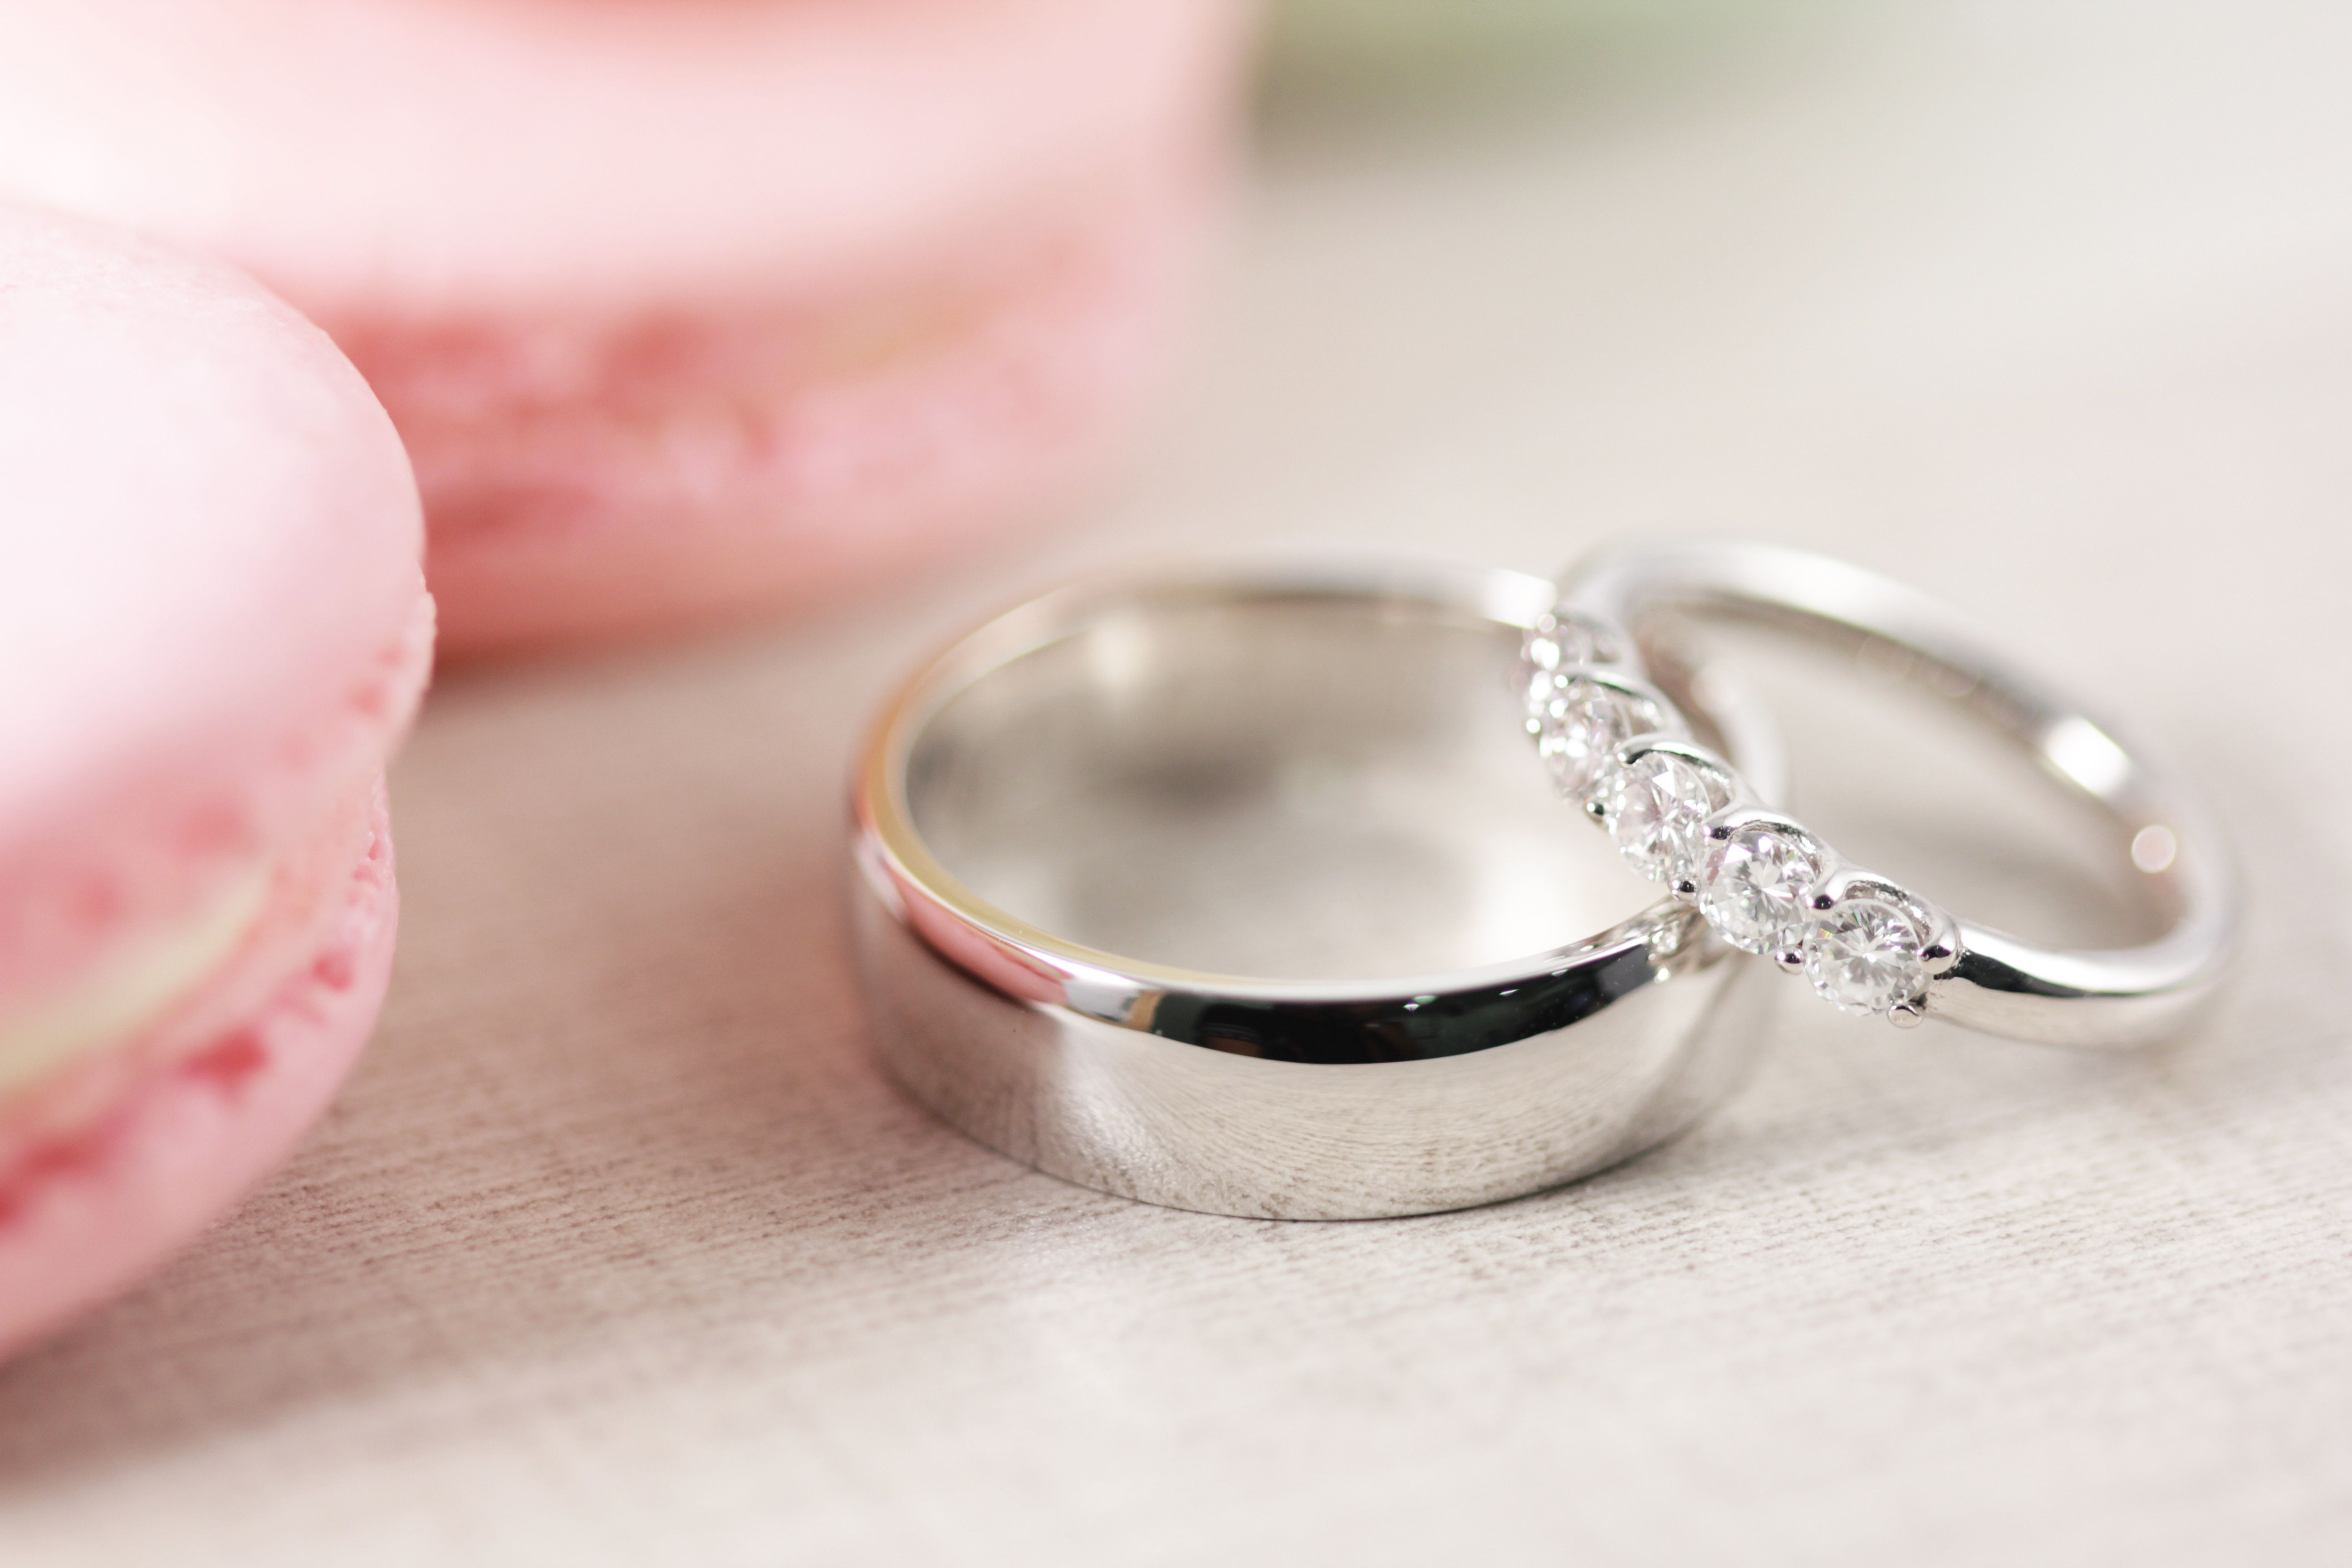 af2cc4eb775e Argolla de matrimonio lisa y churumbela con diamantes fabricadas en oro  blanco.